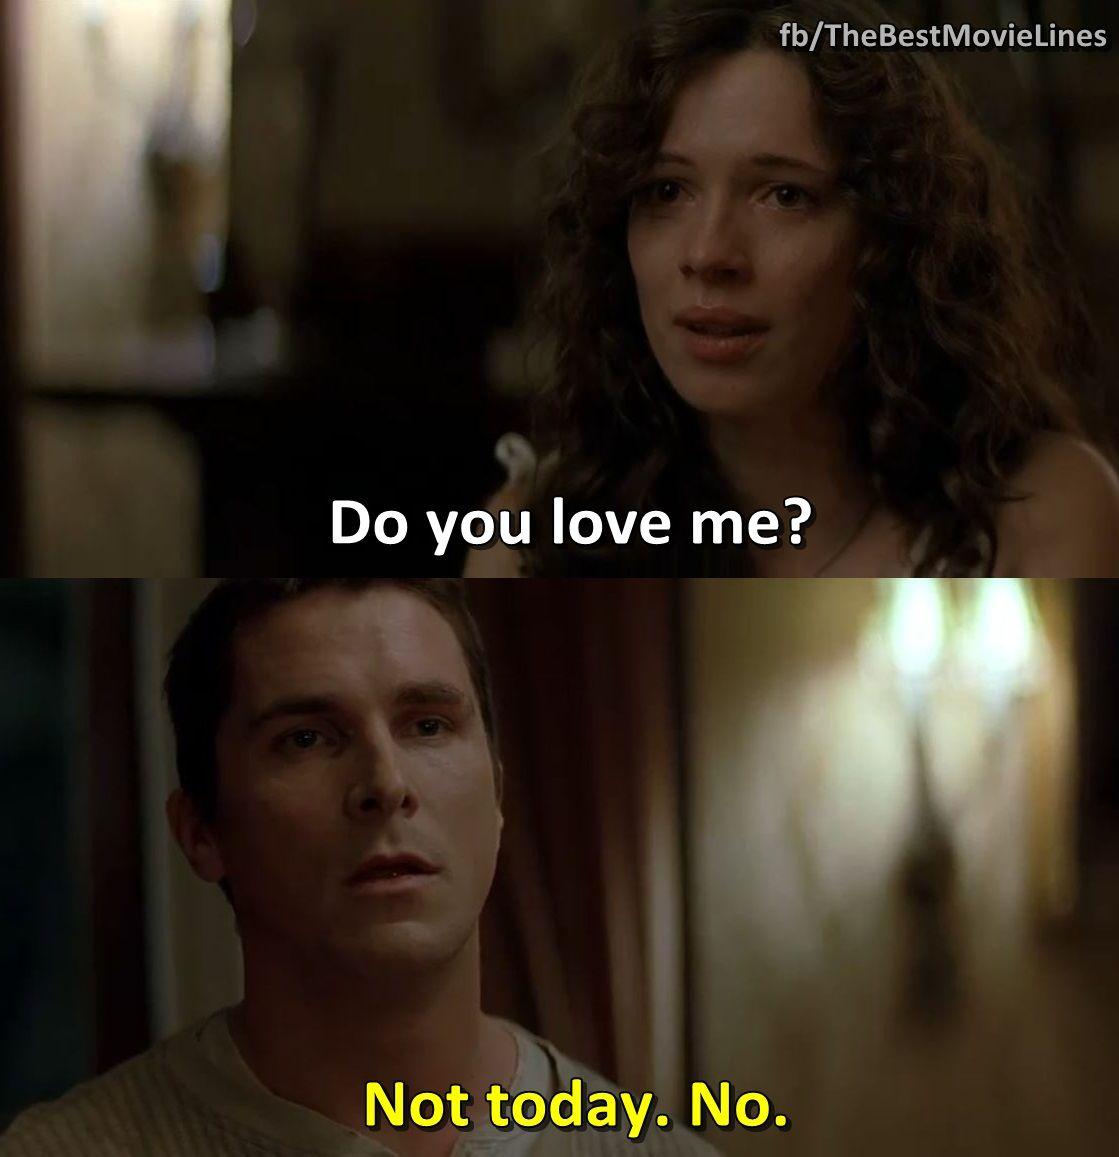 Christian Bale And Rebecca Hall In The Prestige 2006 Favorite